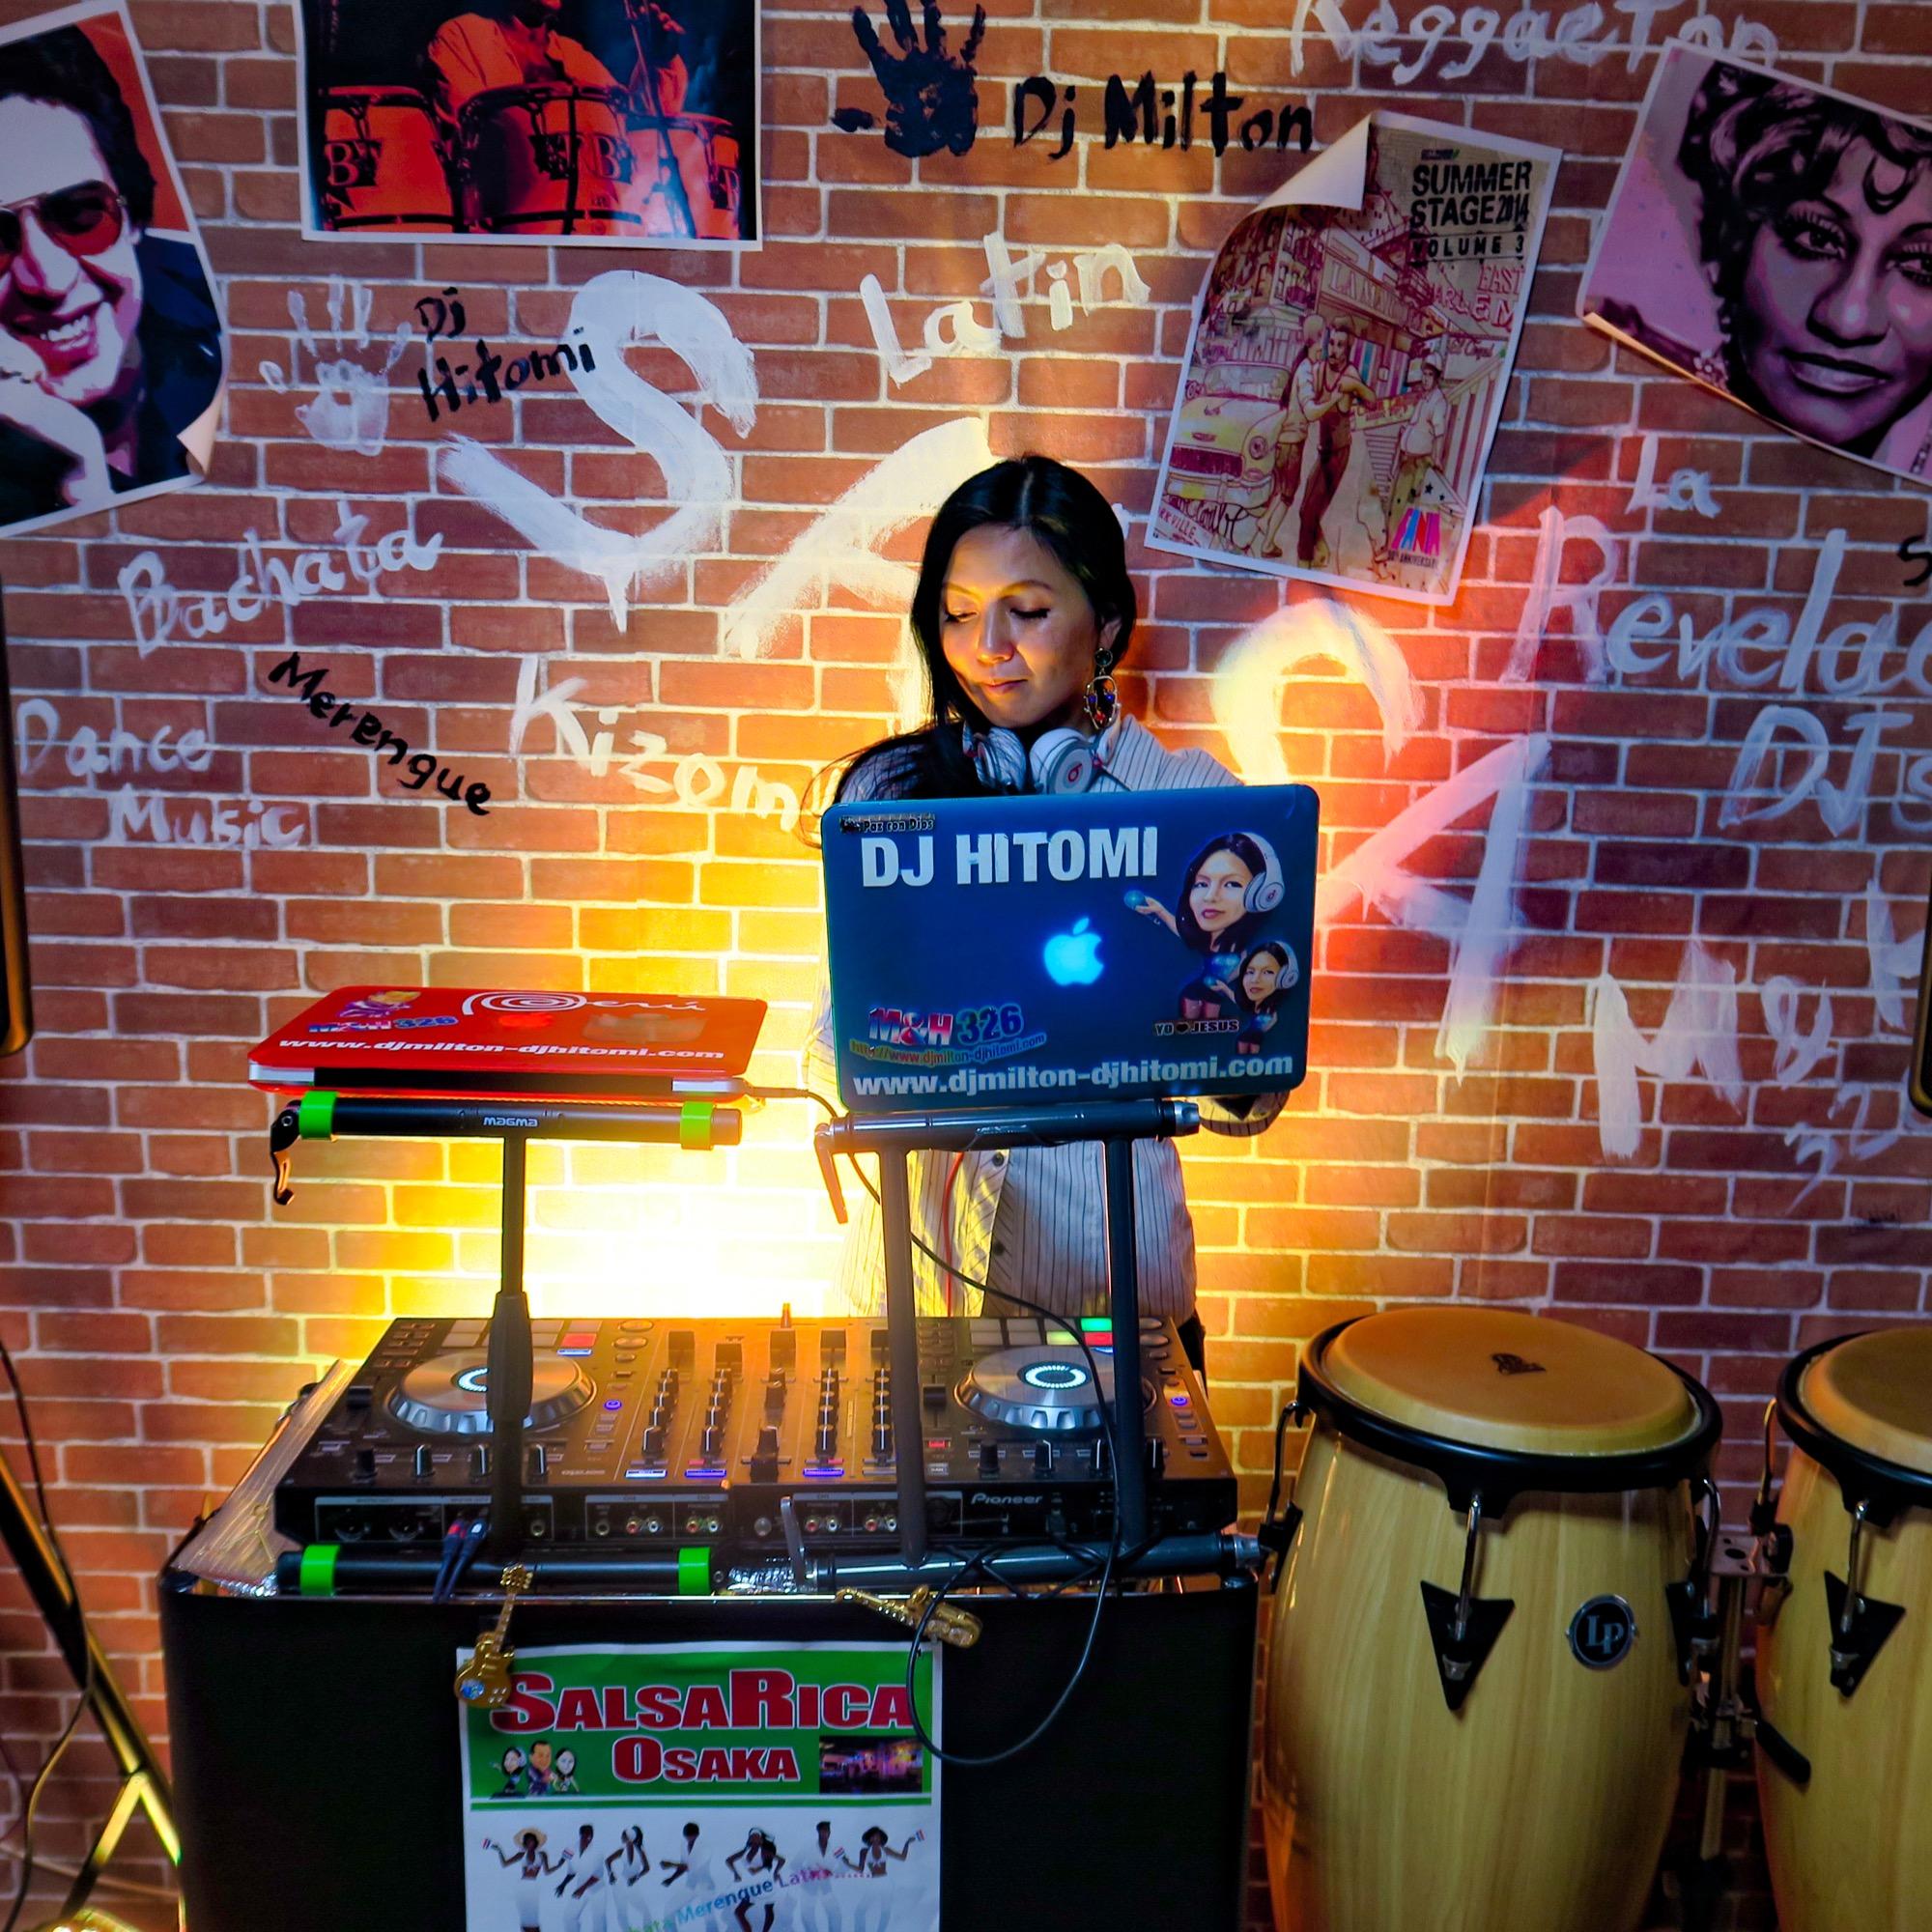 DJ Hitomi